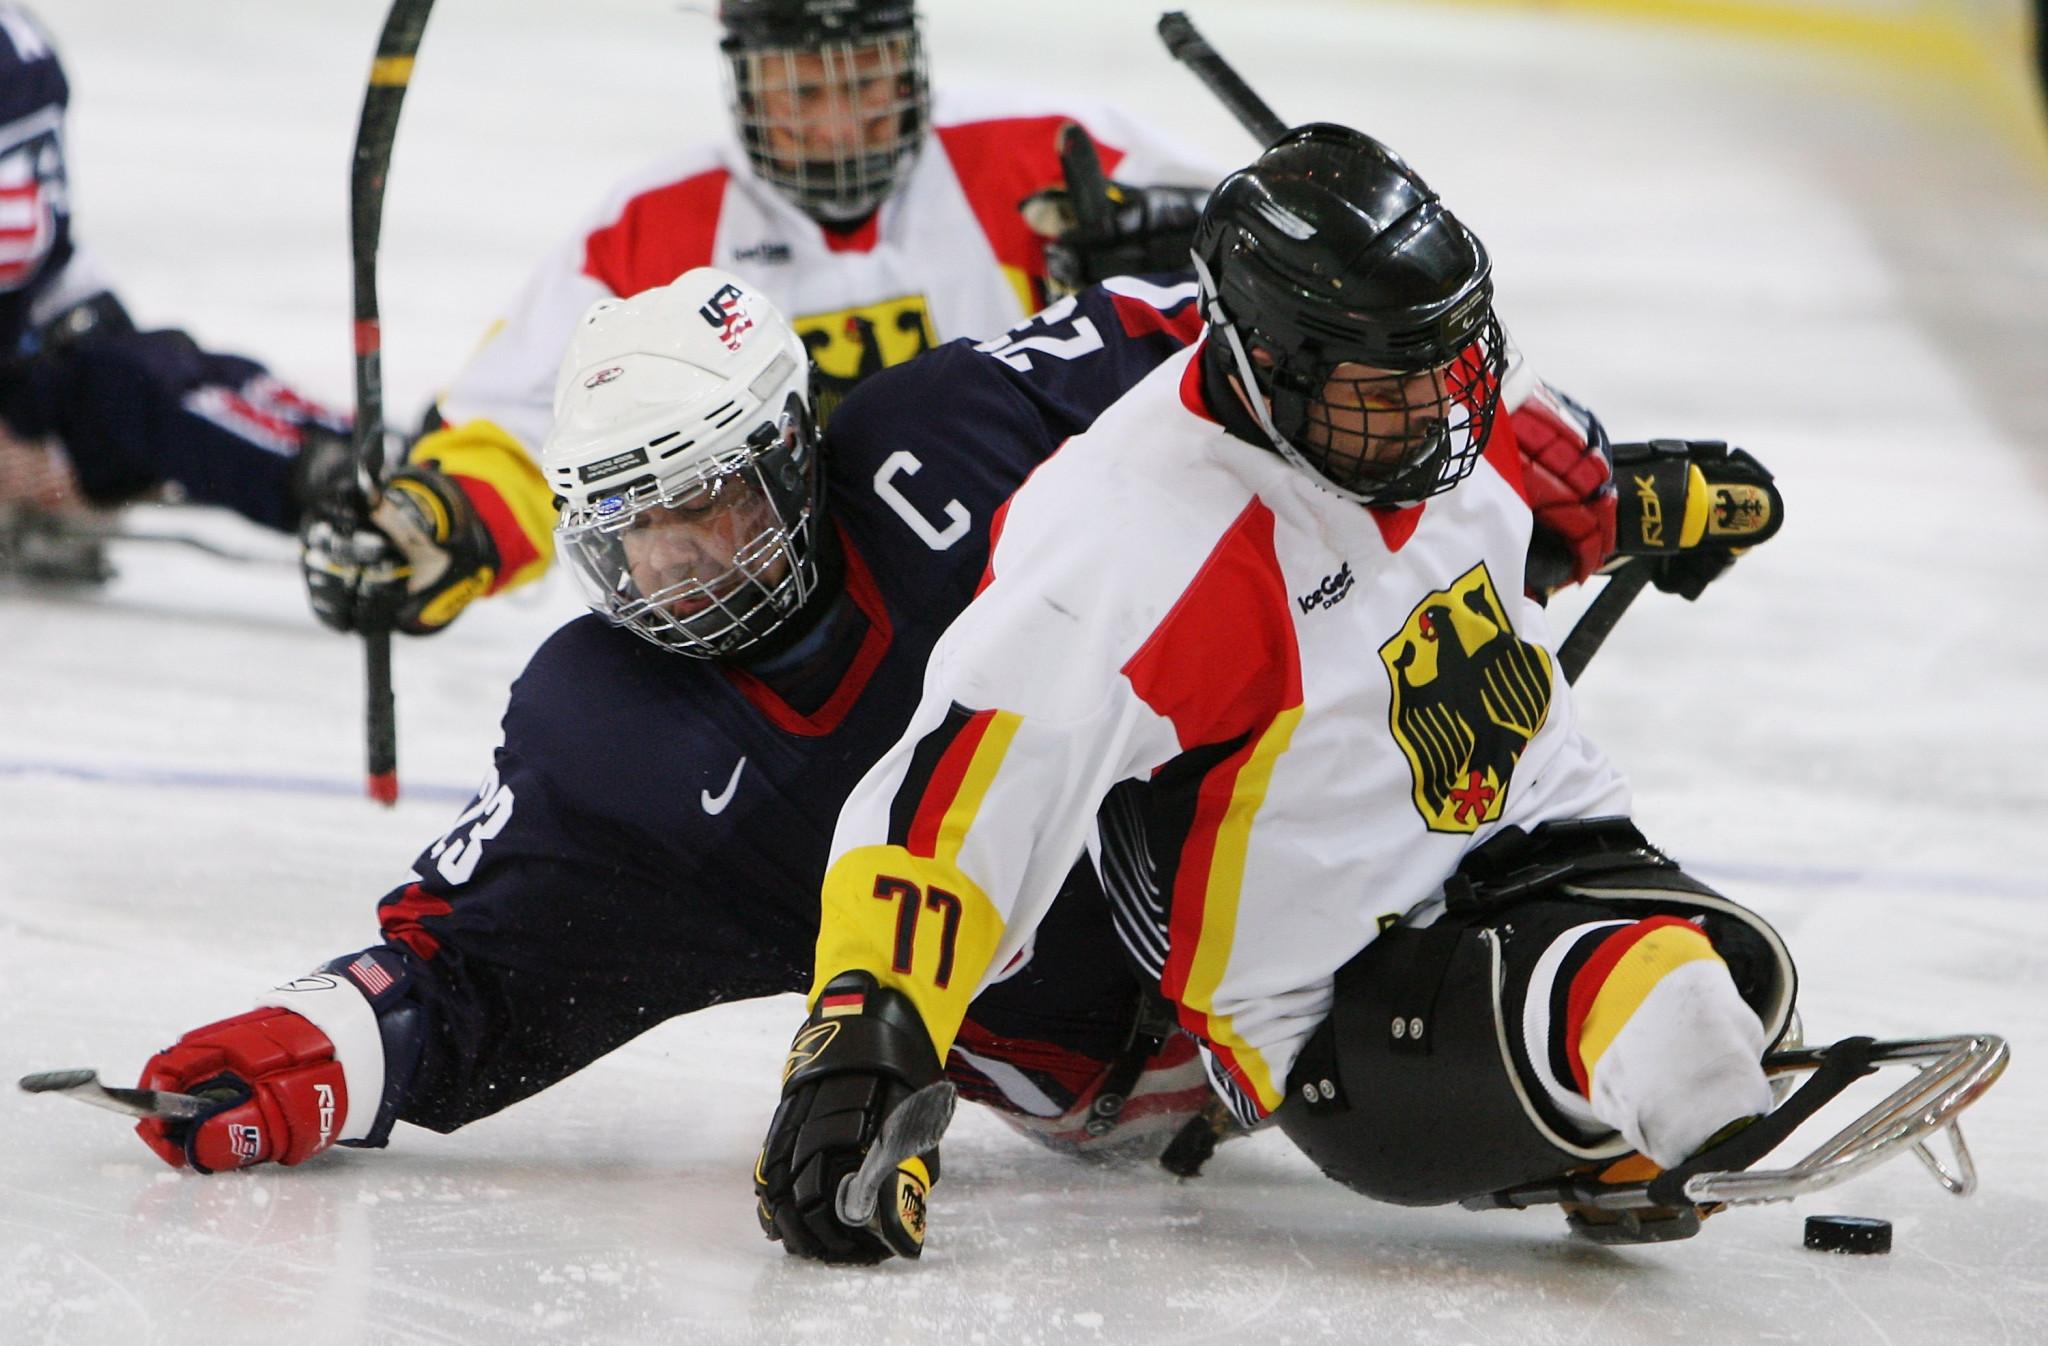 China and Germany hand out heavy defeats at World Para Ice Hockey Championships B-Pool